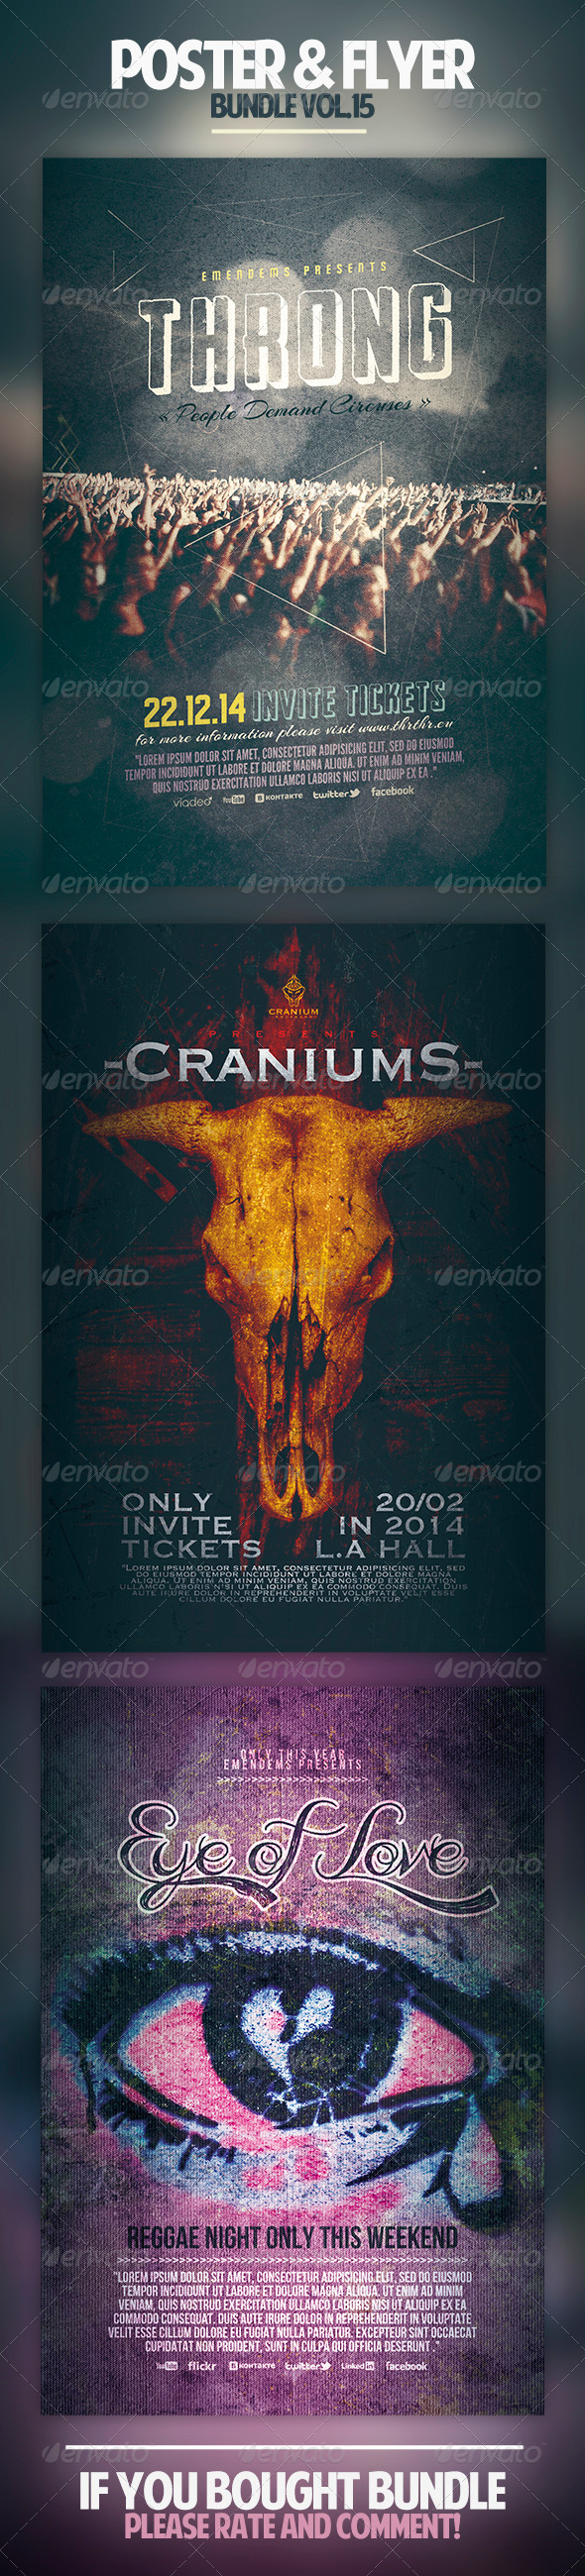 Poster & Flyer Bundle Vol.15 - Concerts Events